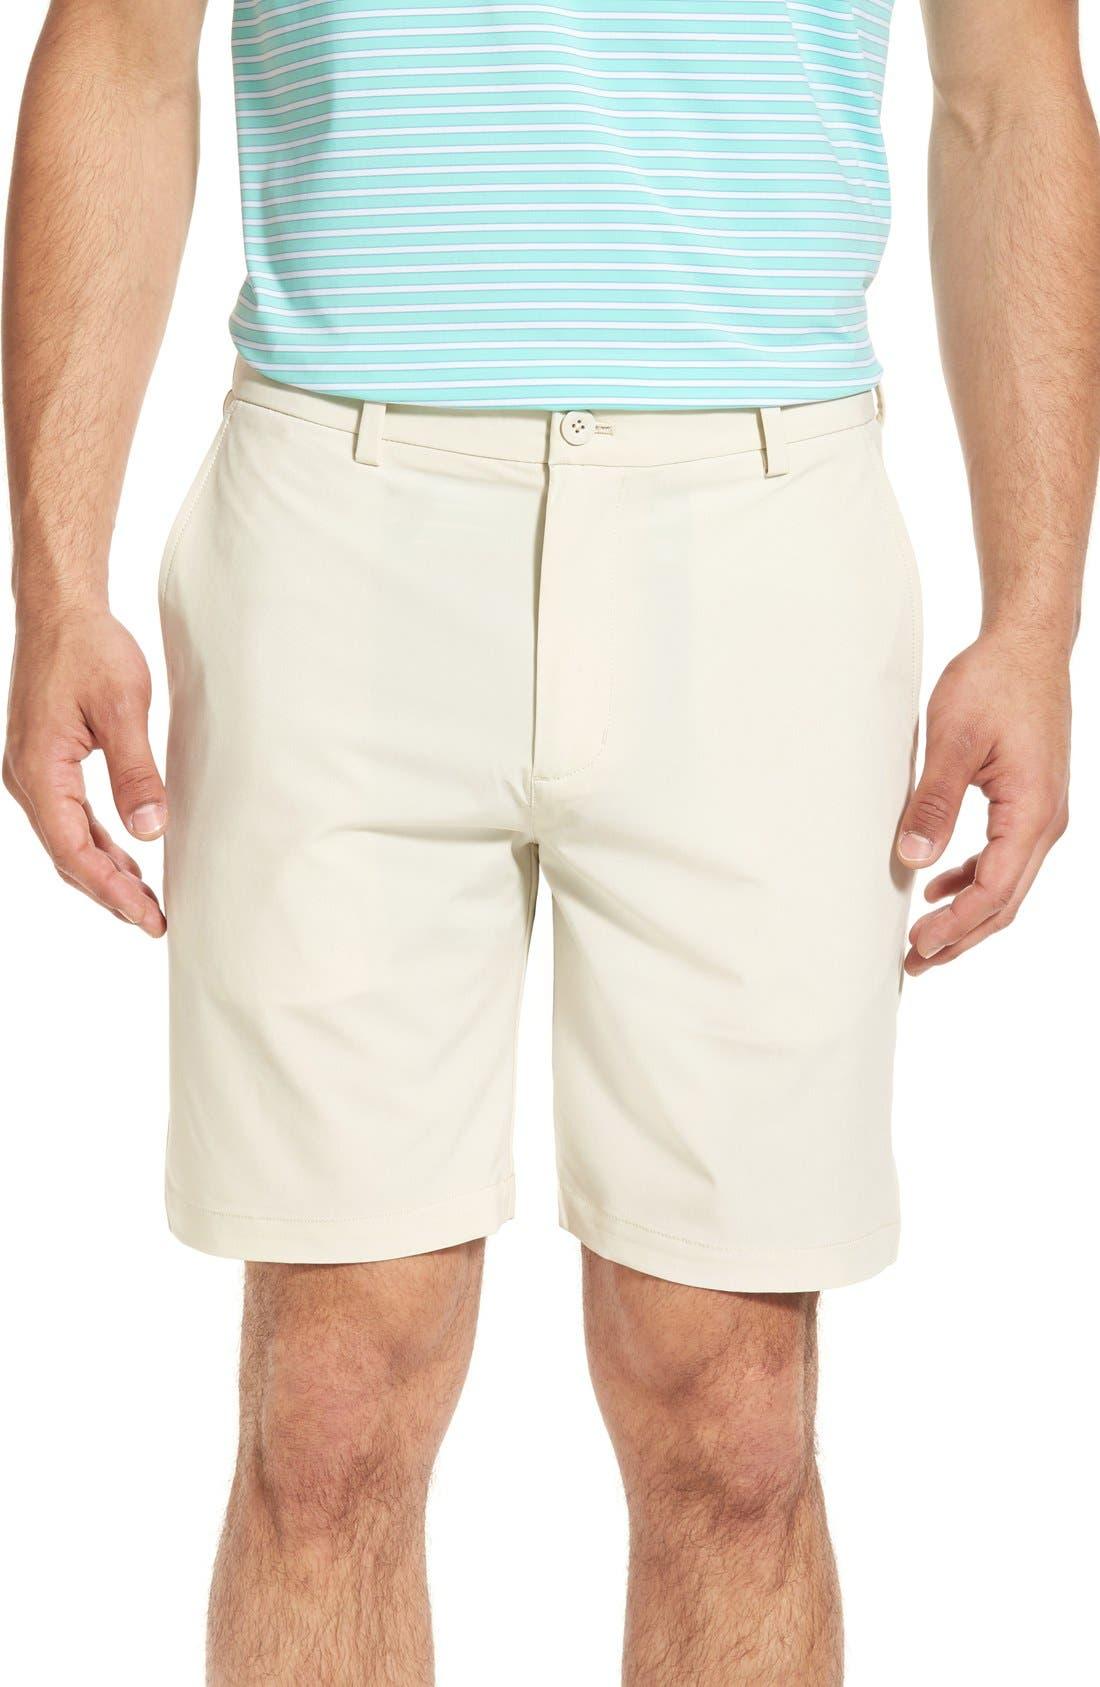 8 Inch Performance Breaker Shorts,                             Main thumbnail 1, color,                             Stone